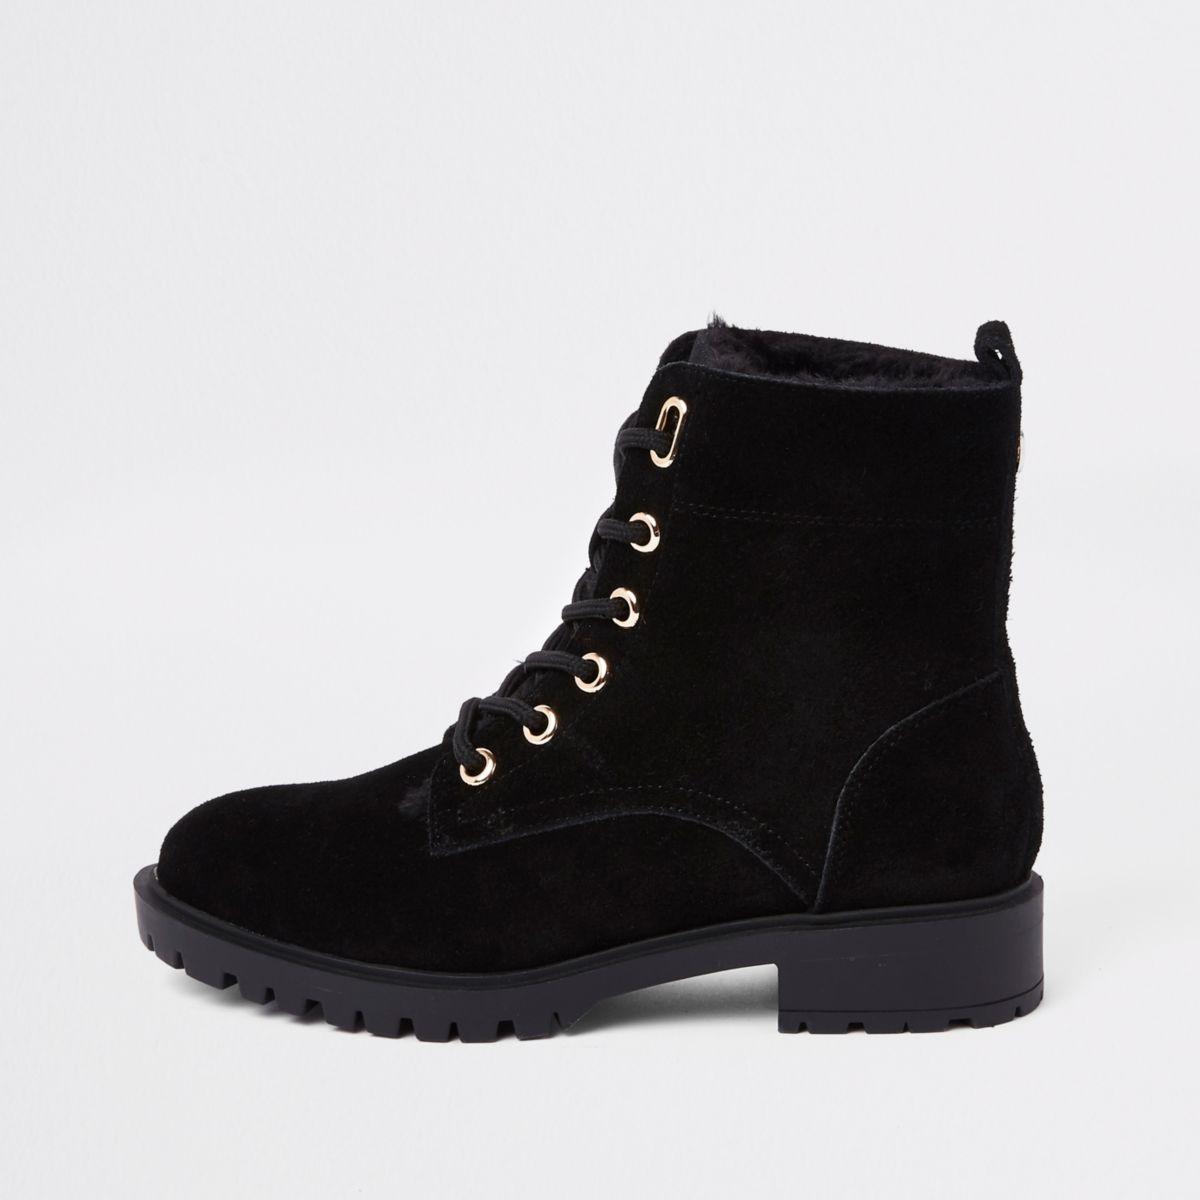 Black faux fur lined lace-up ankle boots